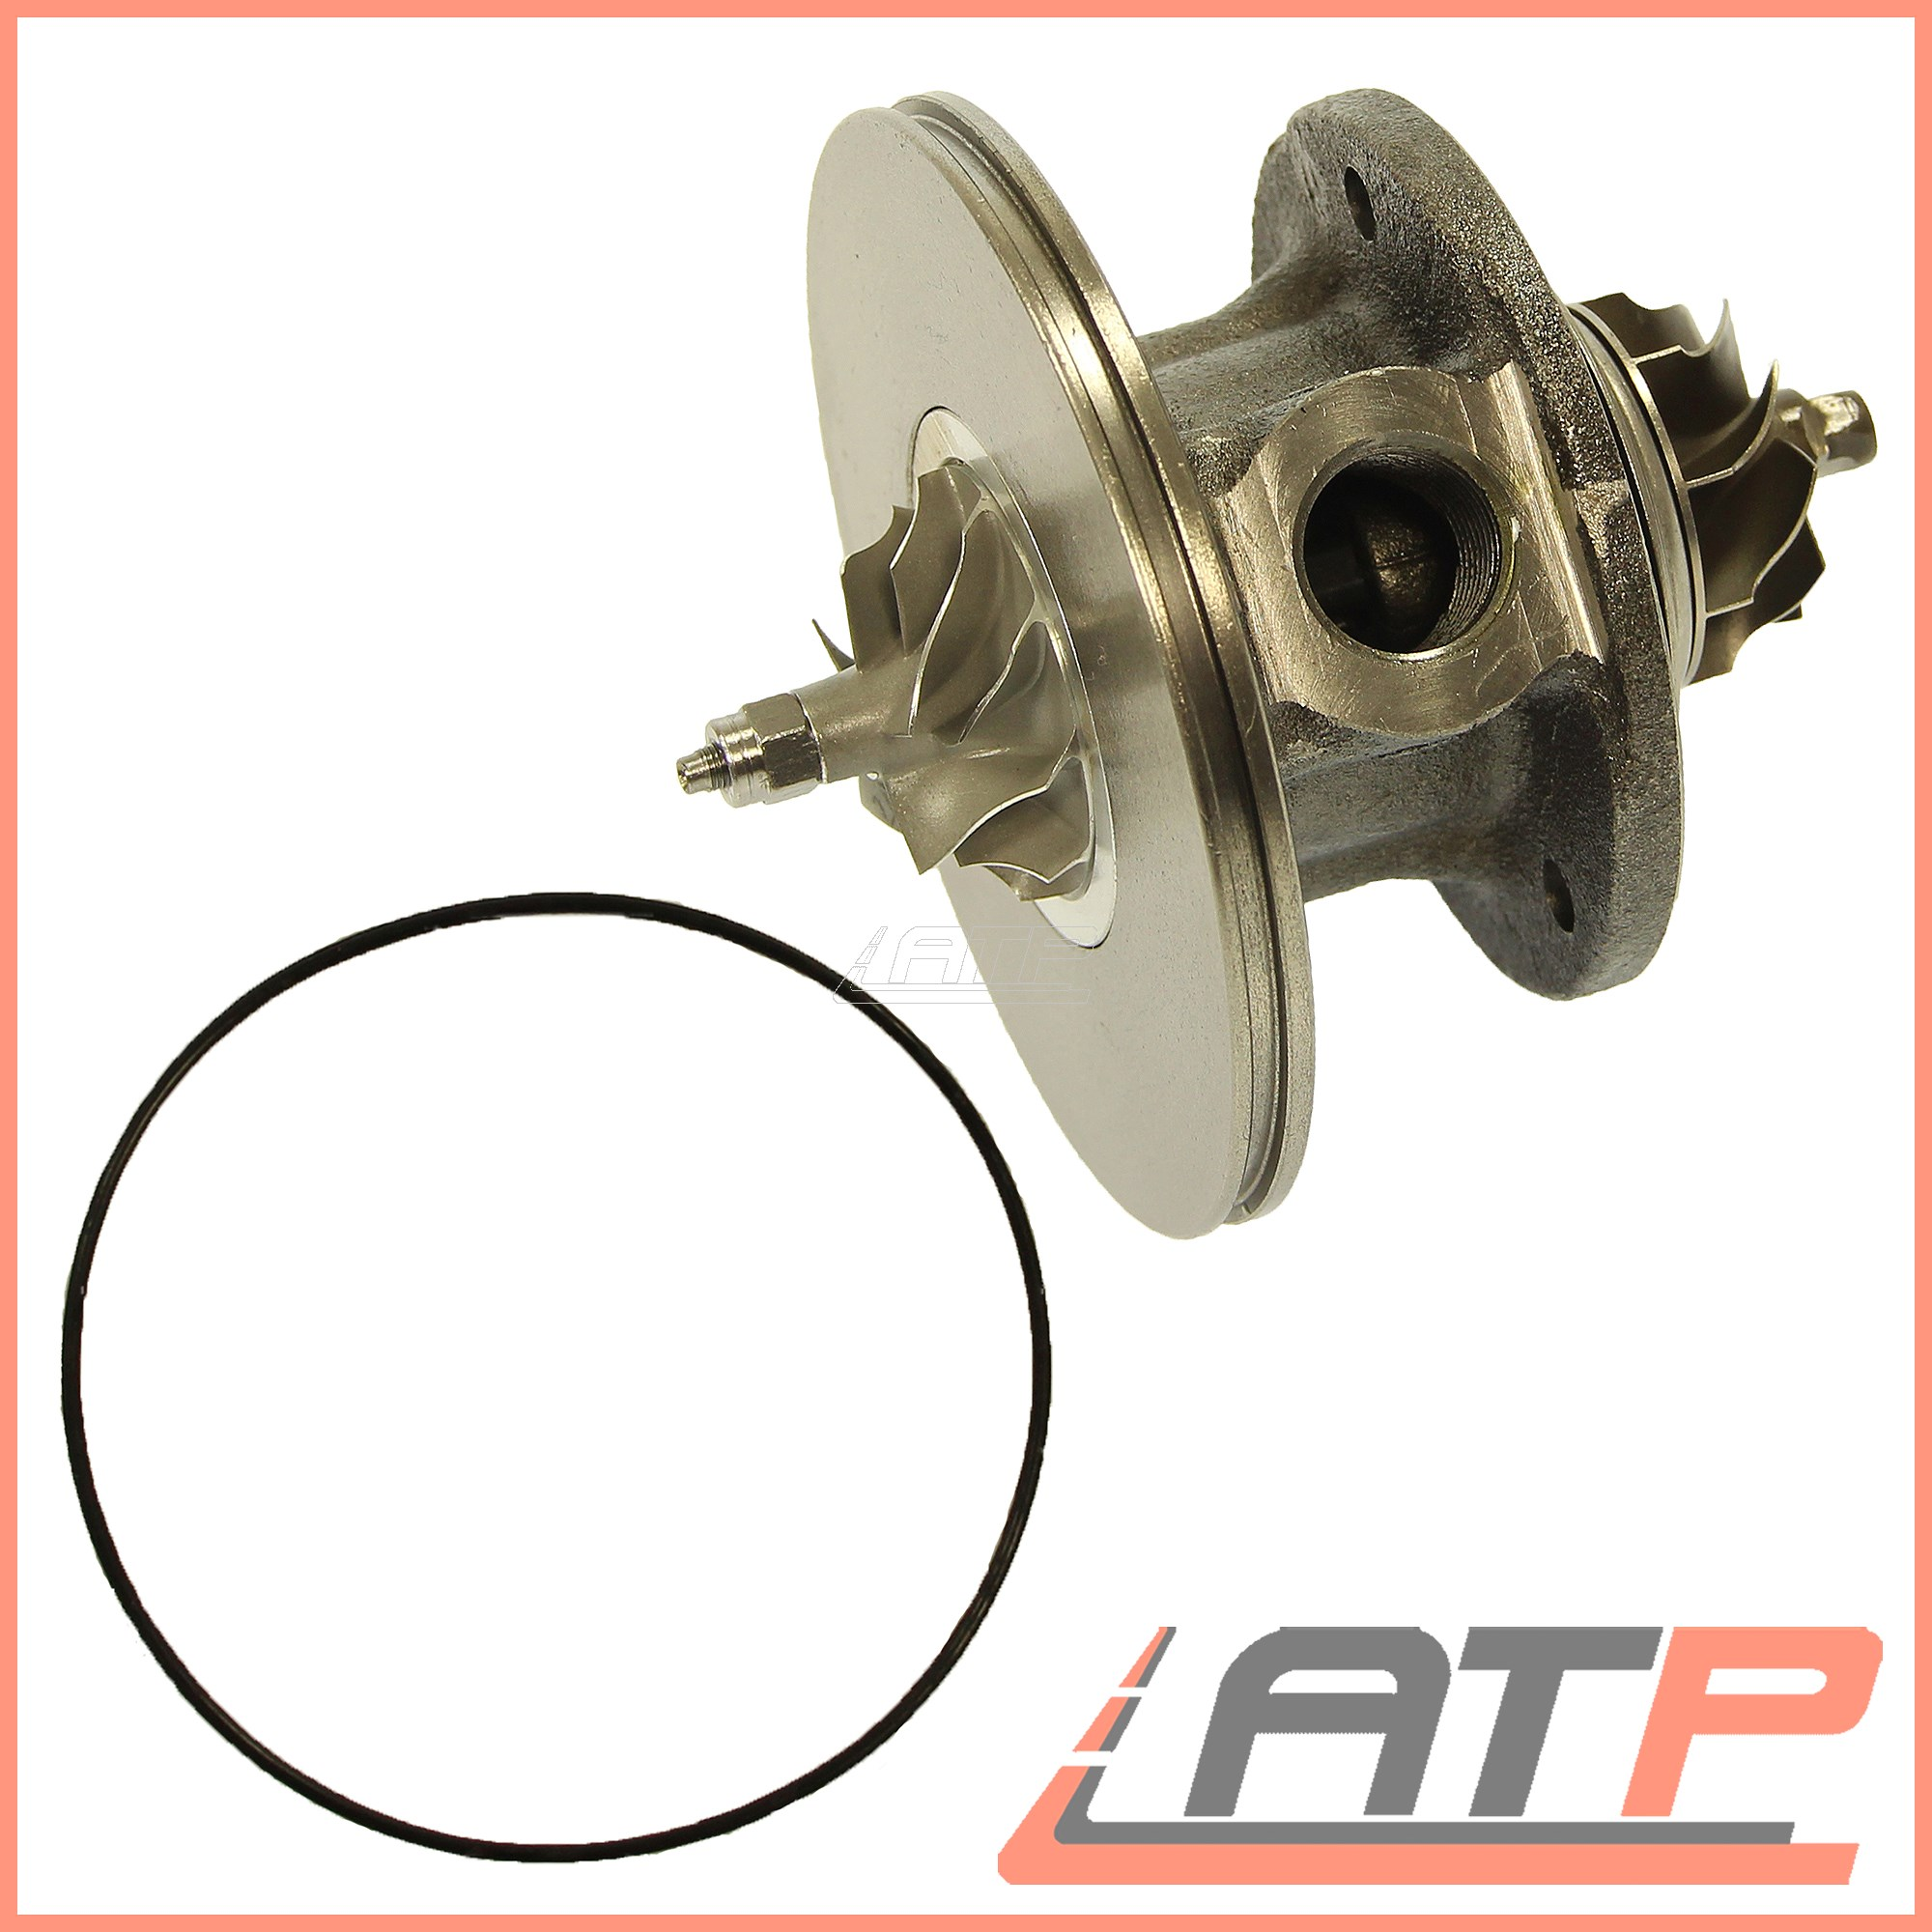 Tappetino Vasca senza antiscivolo per Ford Transit Connect p65 riquadro 02-13